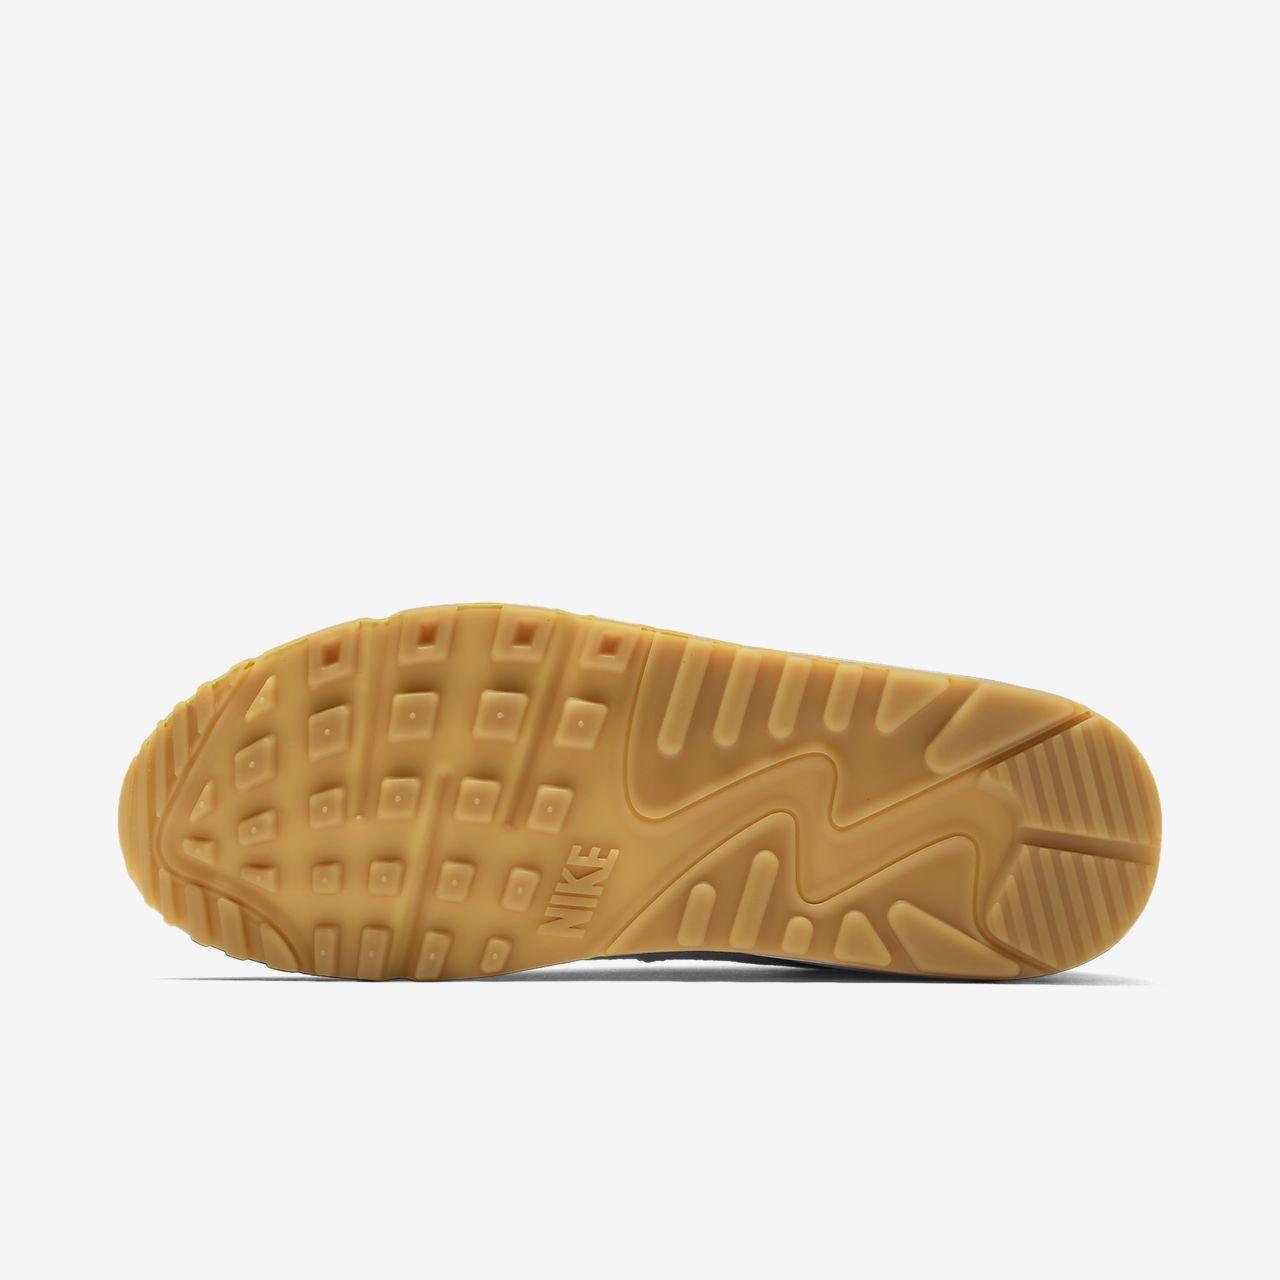 scarpa nike air max 90 biancogum light brownbianco 325213 135